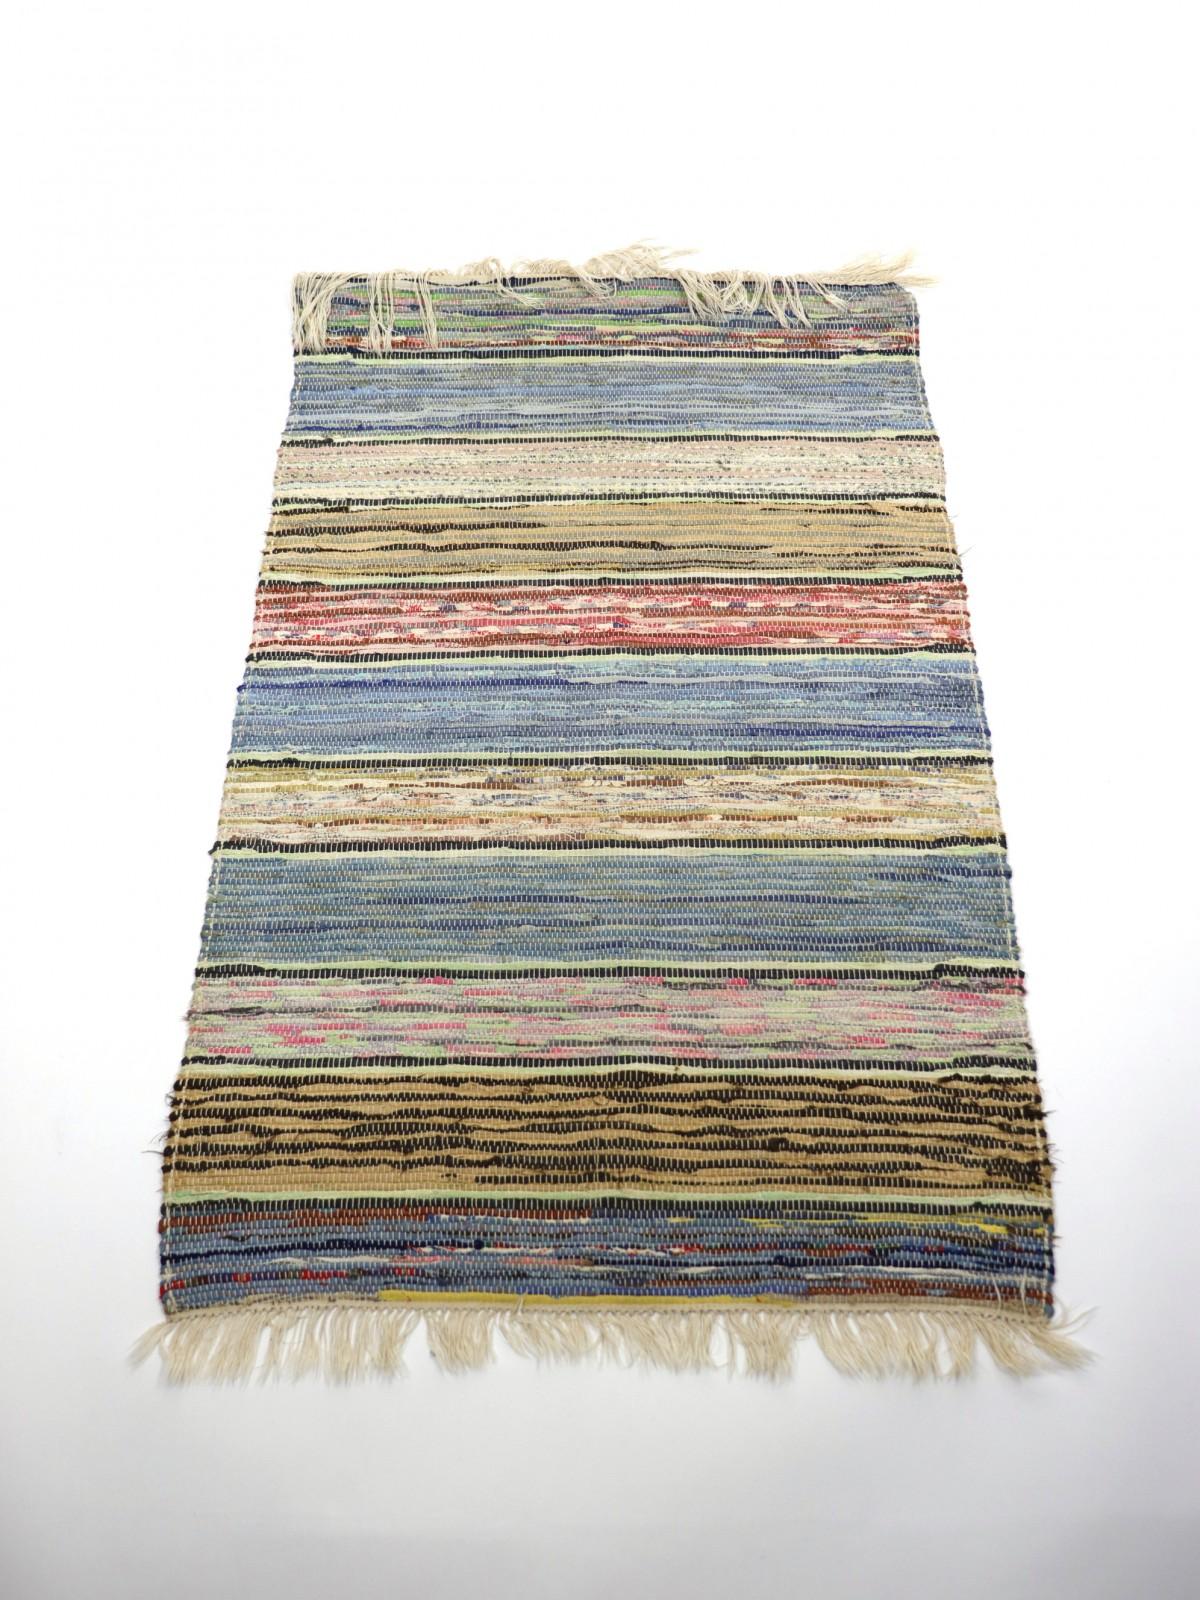 swedish rag rug, cotton, 1930's